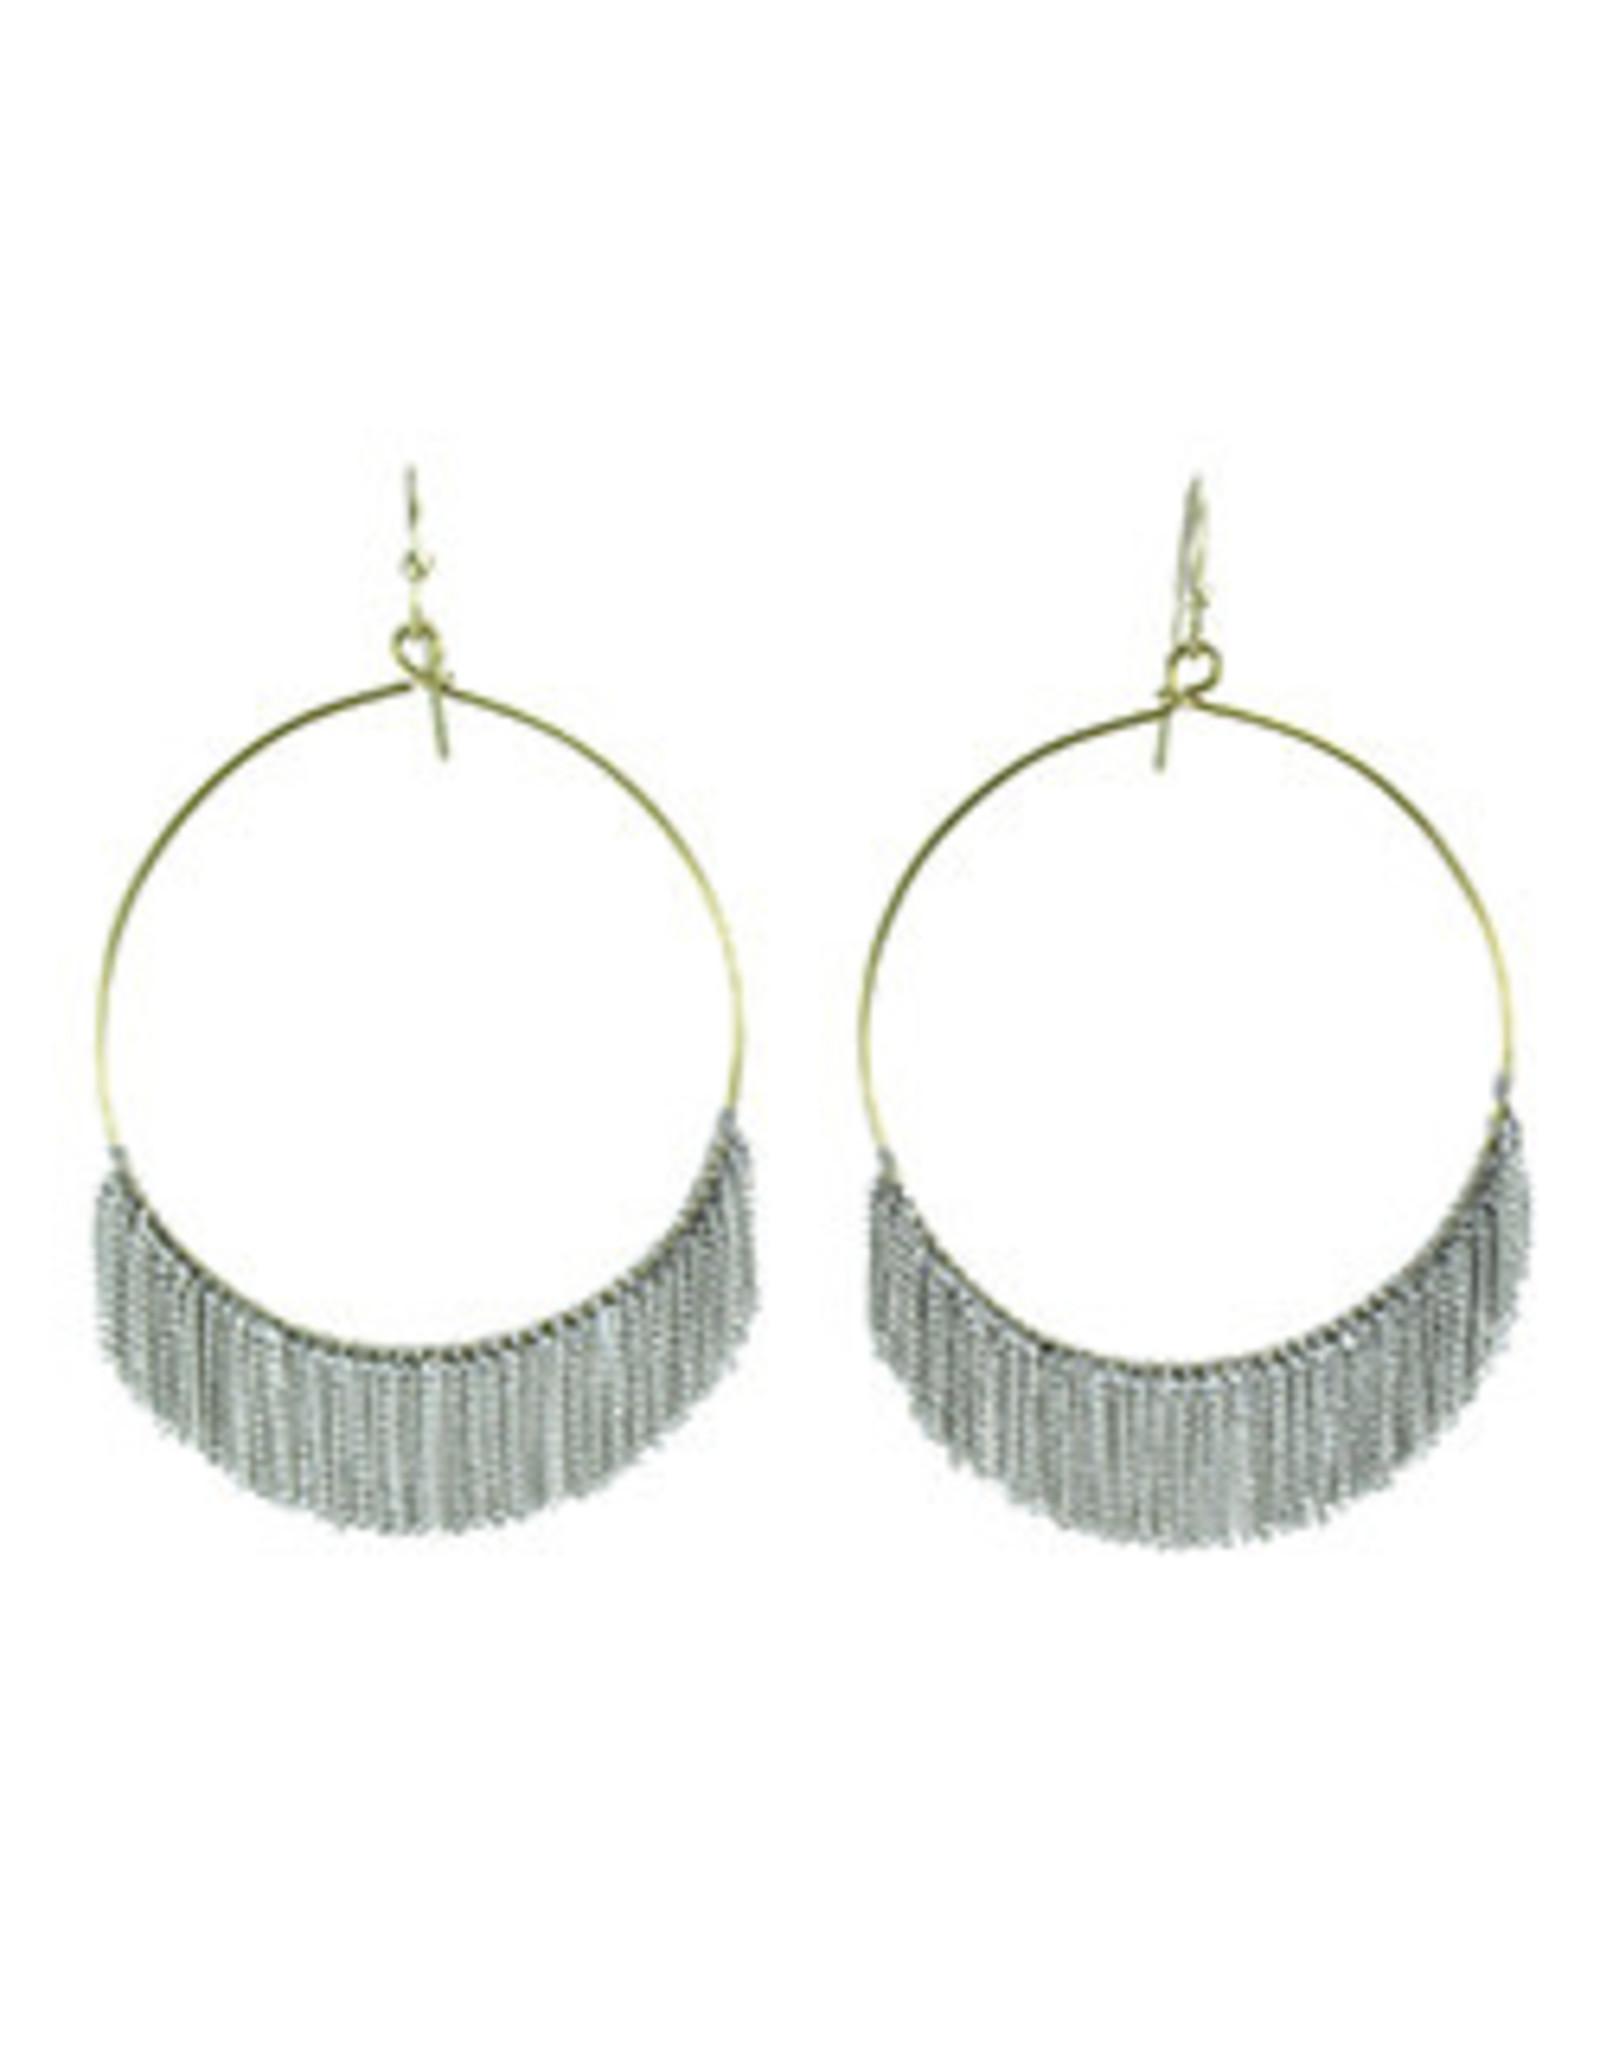 Delicate Fringed Chain Hoops  Silver Earrings